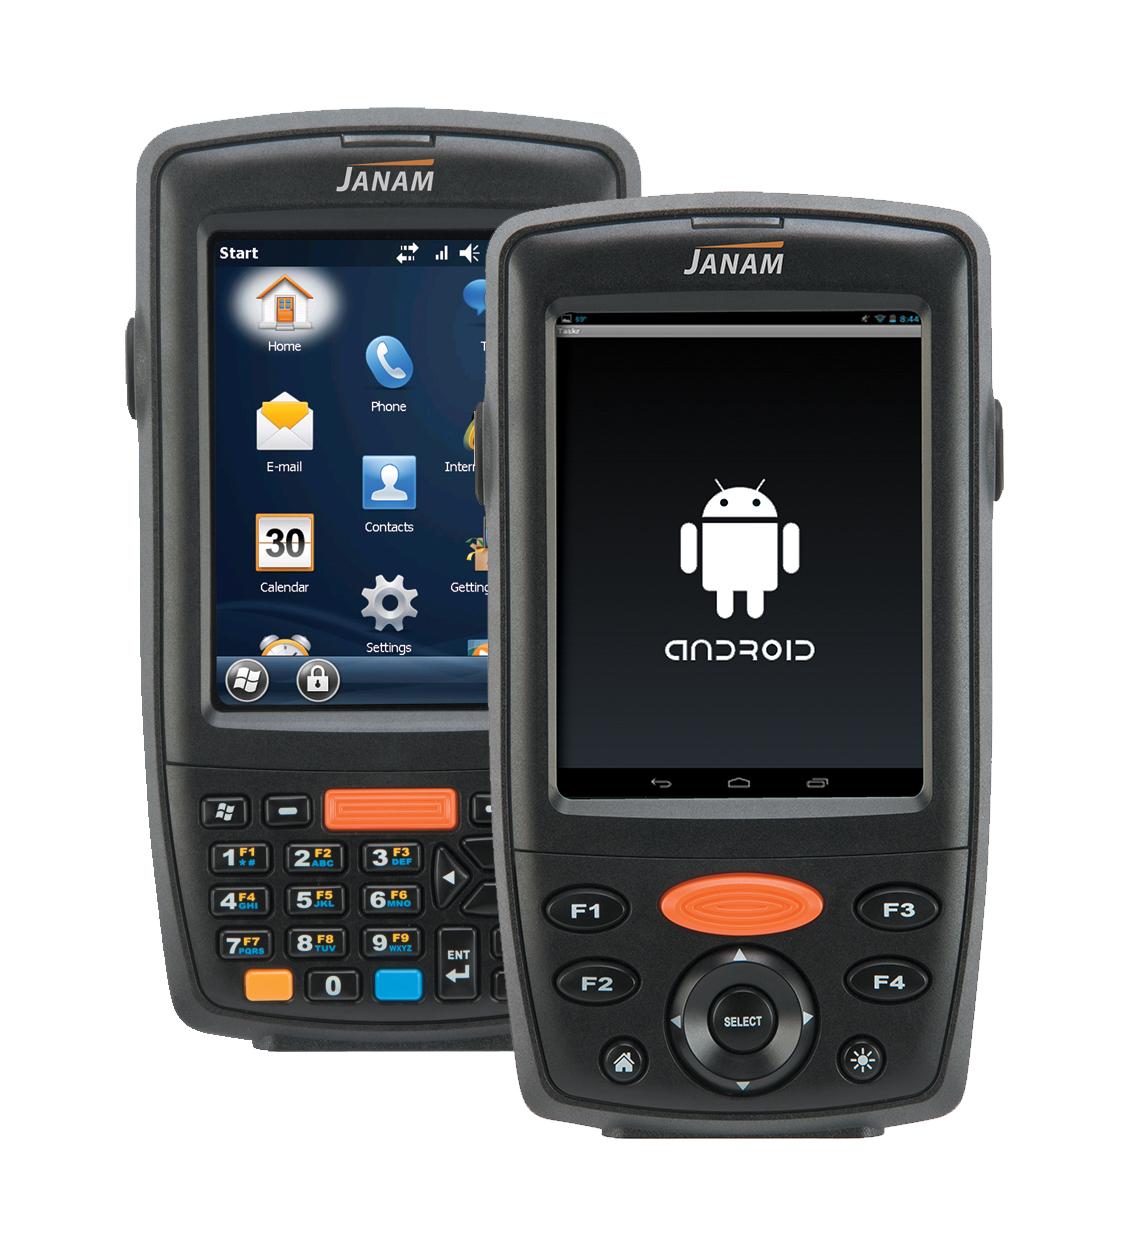 Xm70 Rugged Mobile Computer Janam